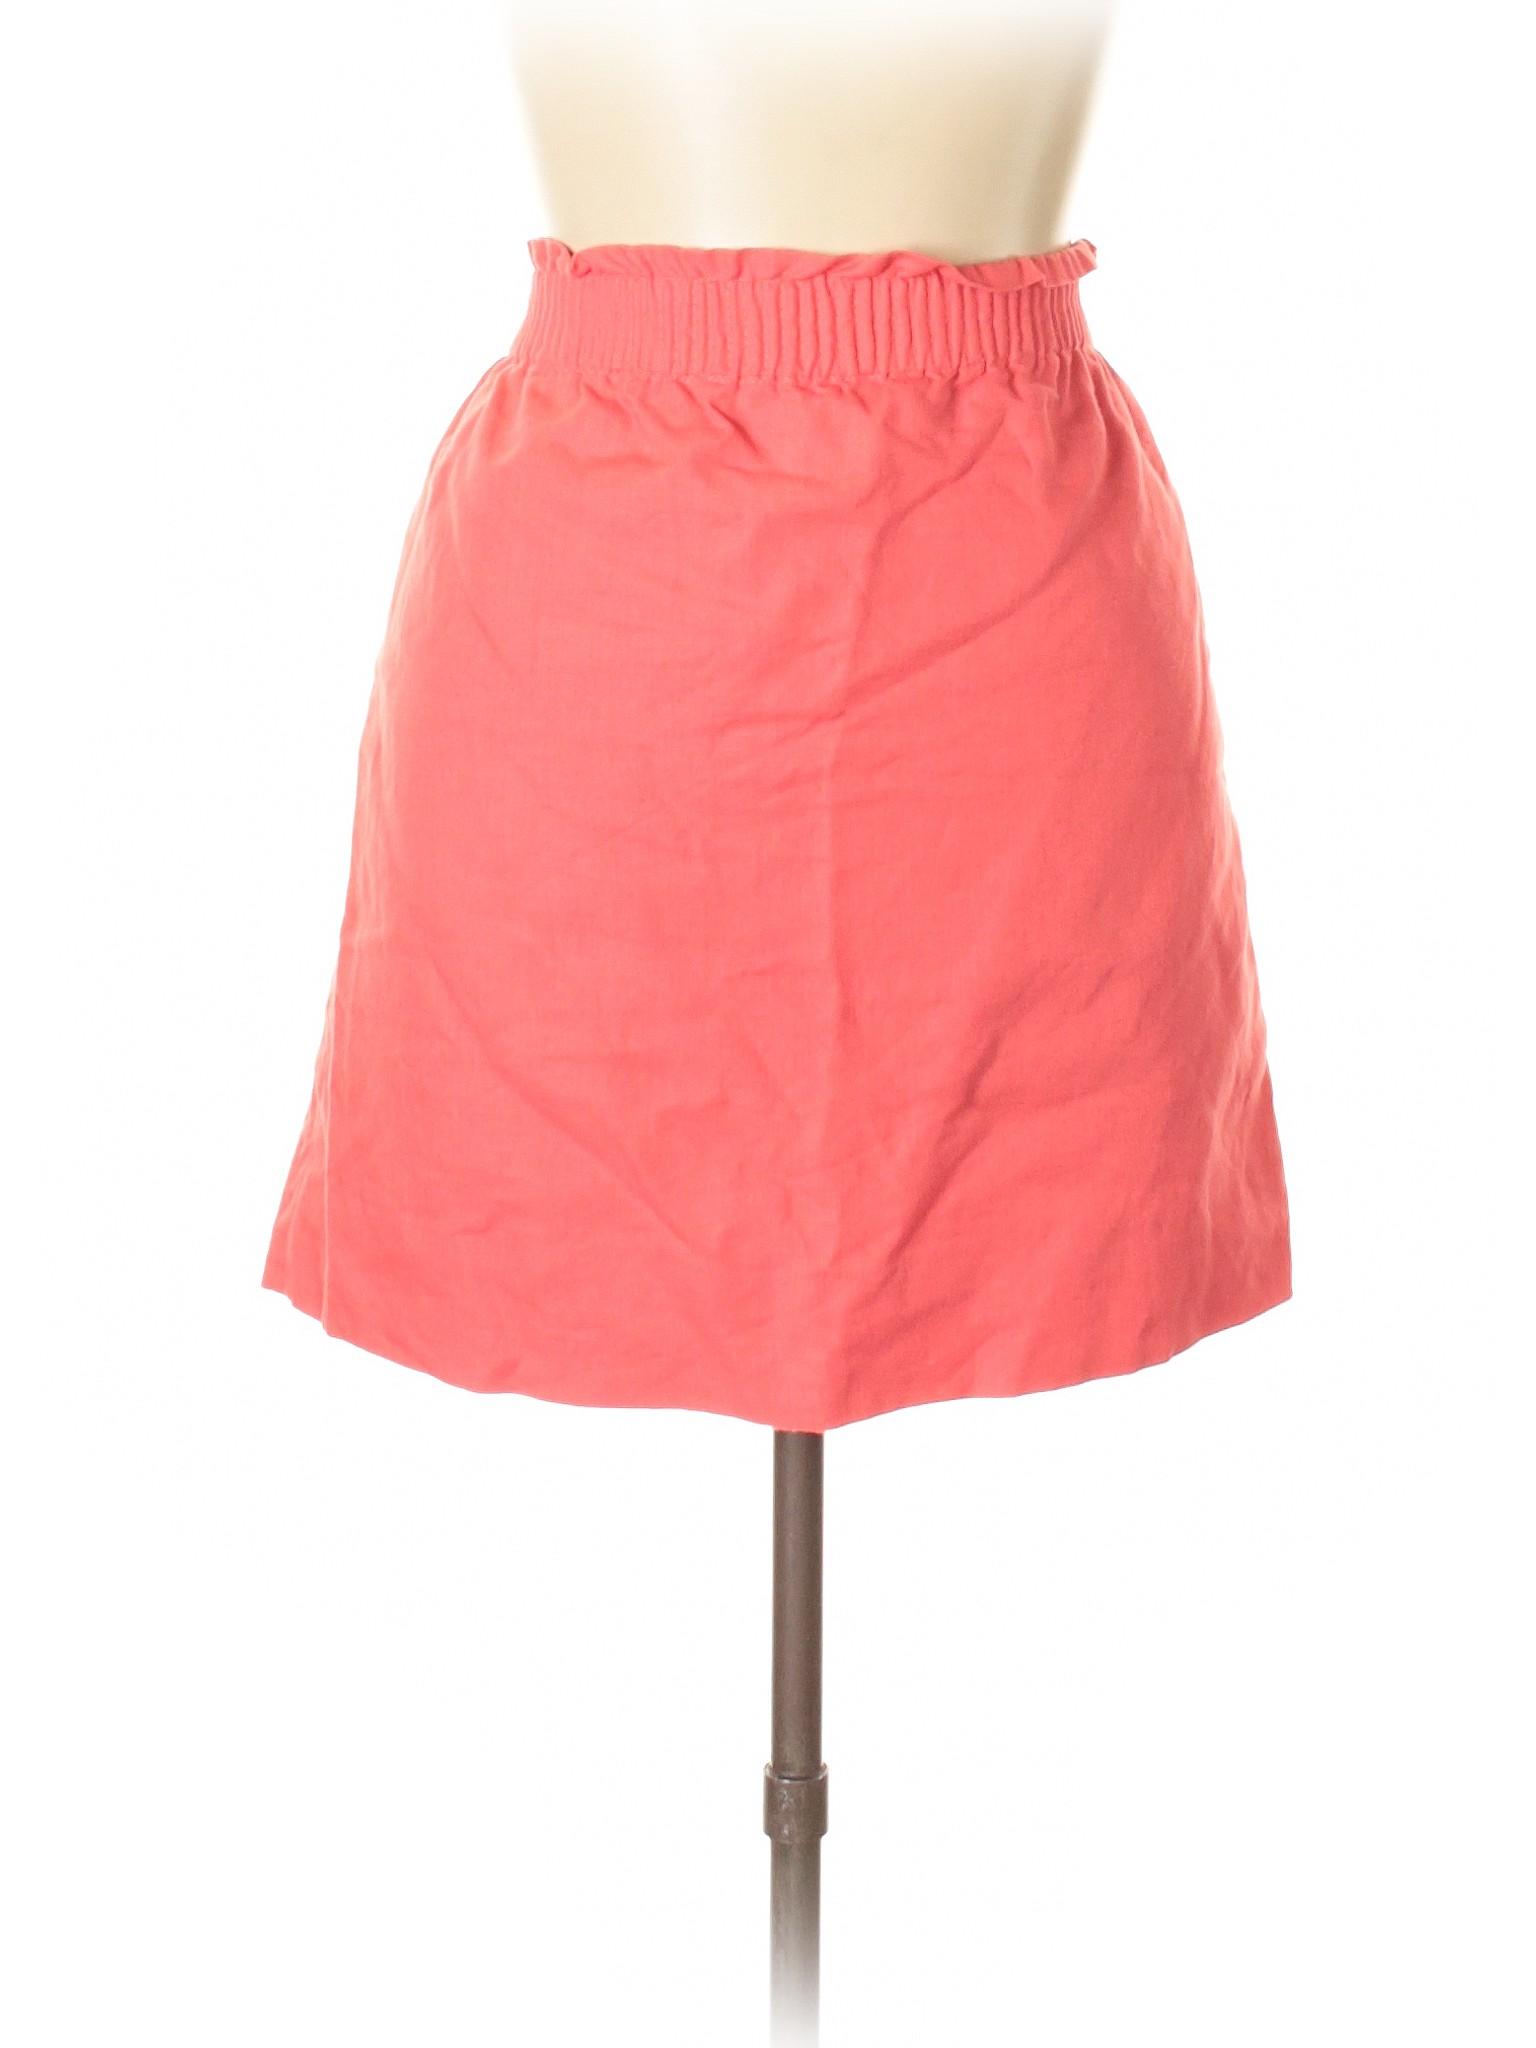 Casual Casual Boutique Casual Skirt Skirt Boutique Boutique wwqORUf